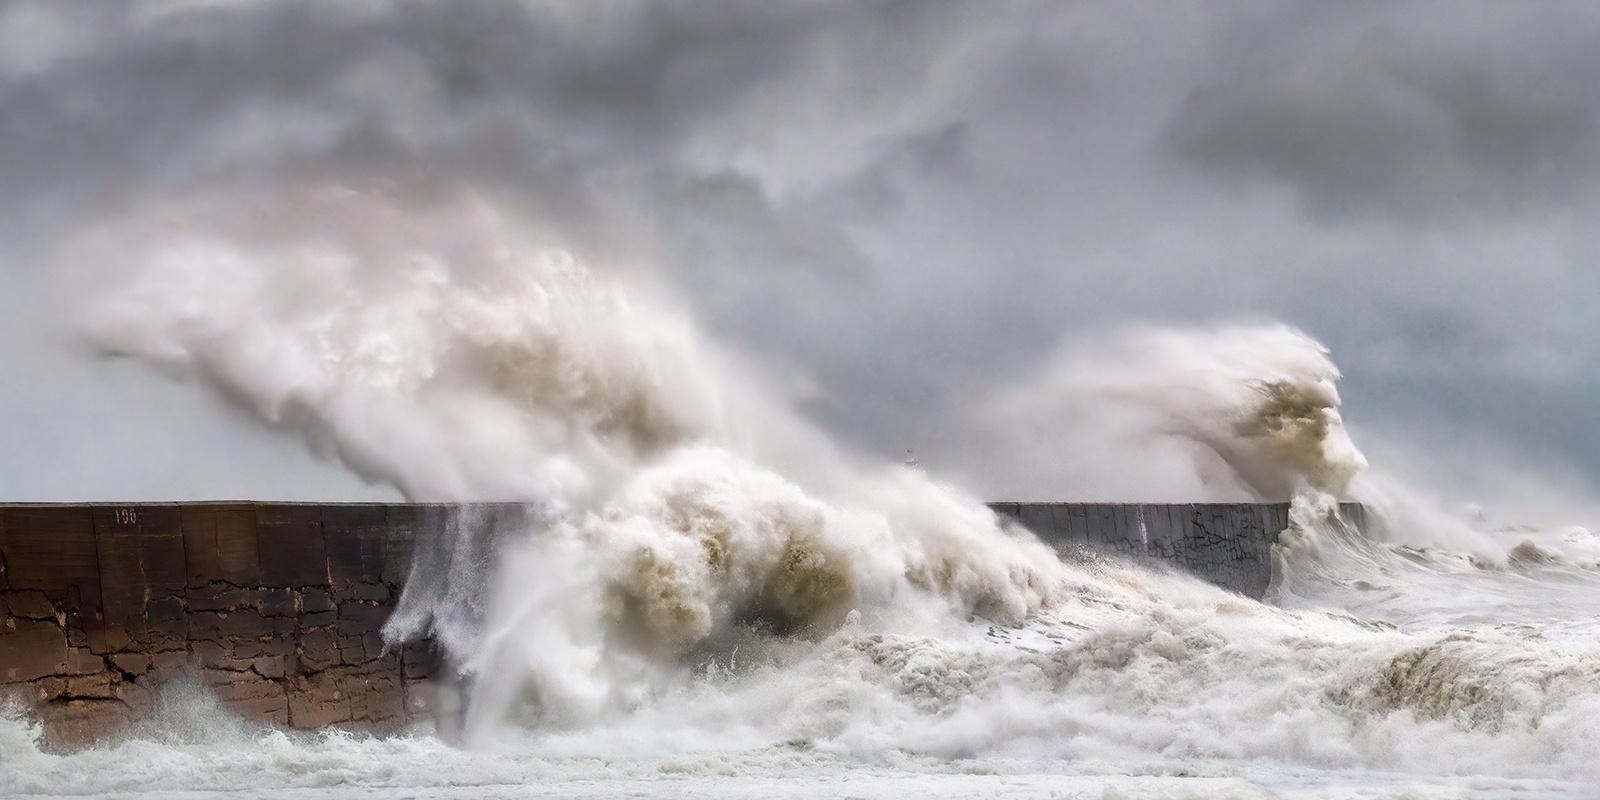 Jim-Munday-Storm-Waves-9